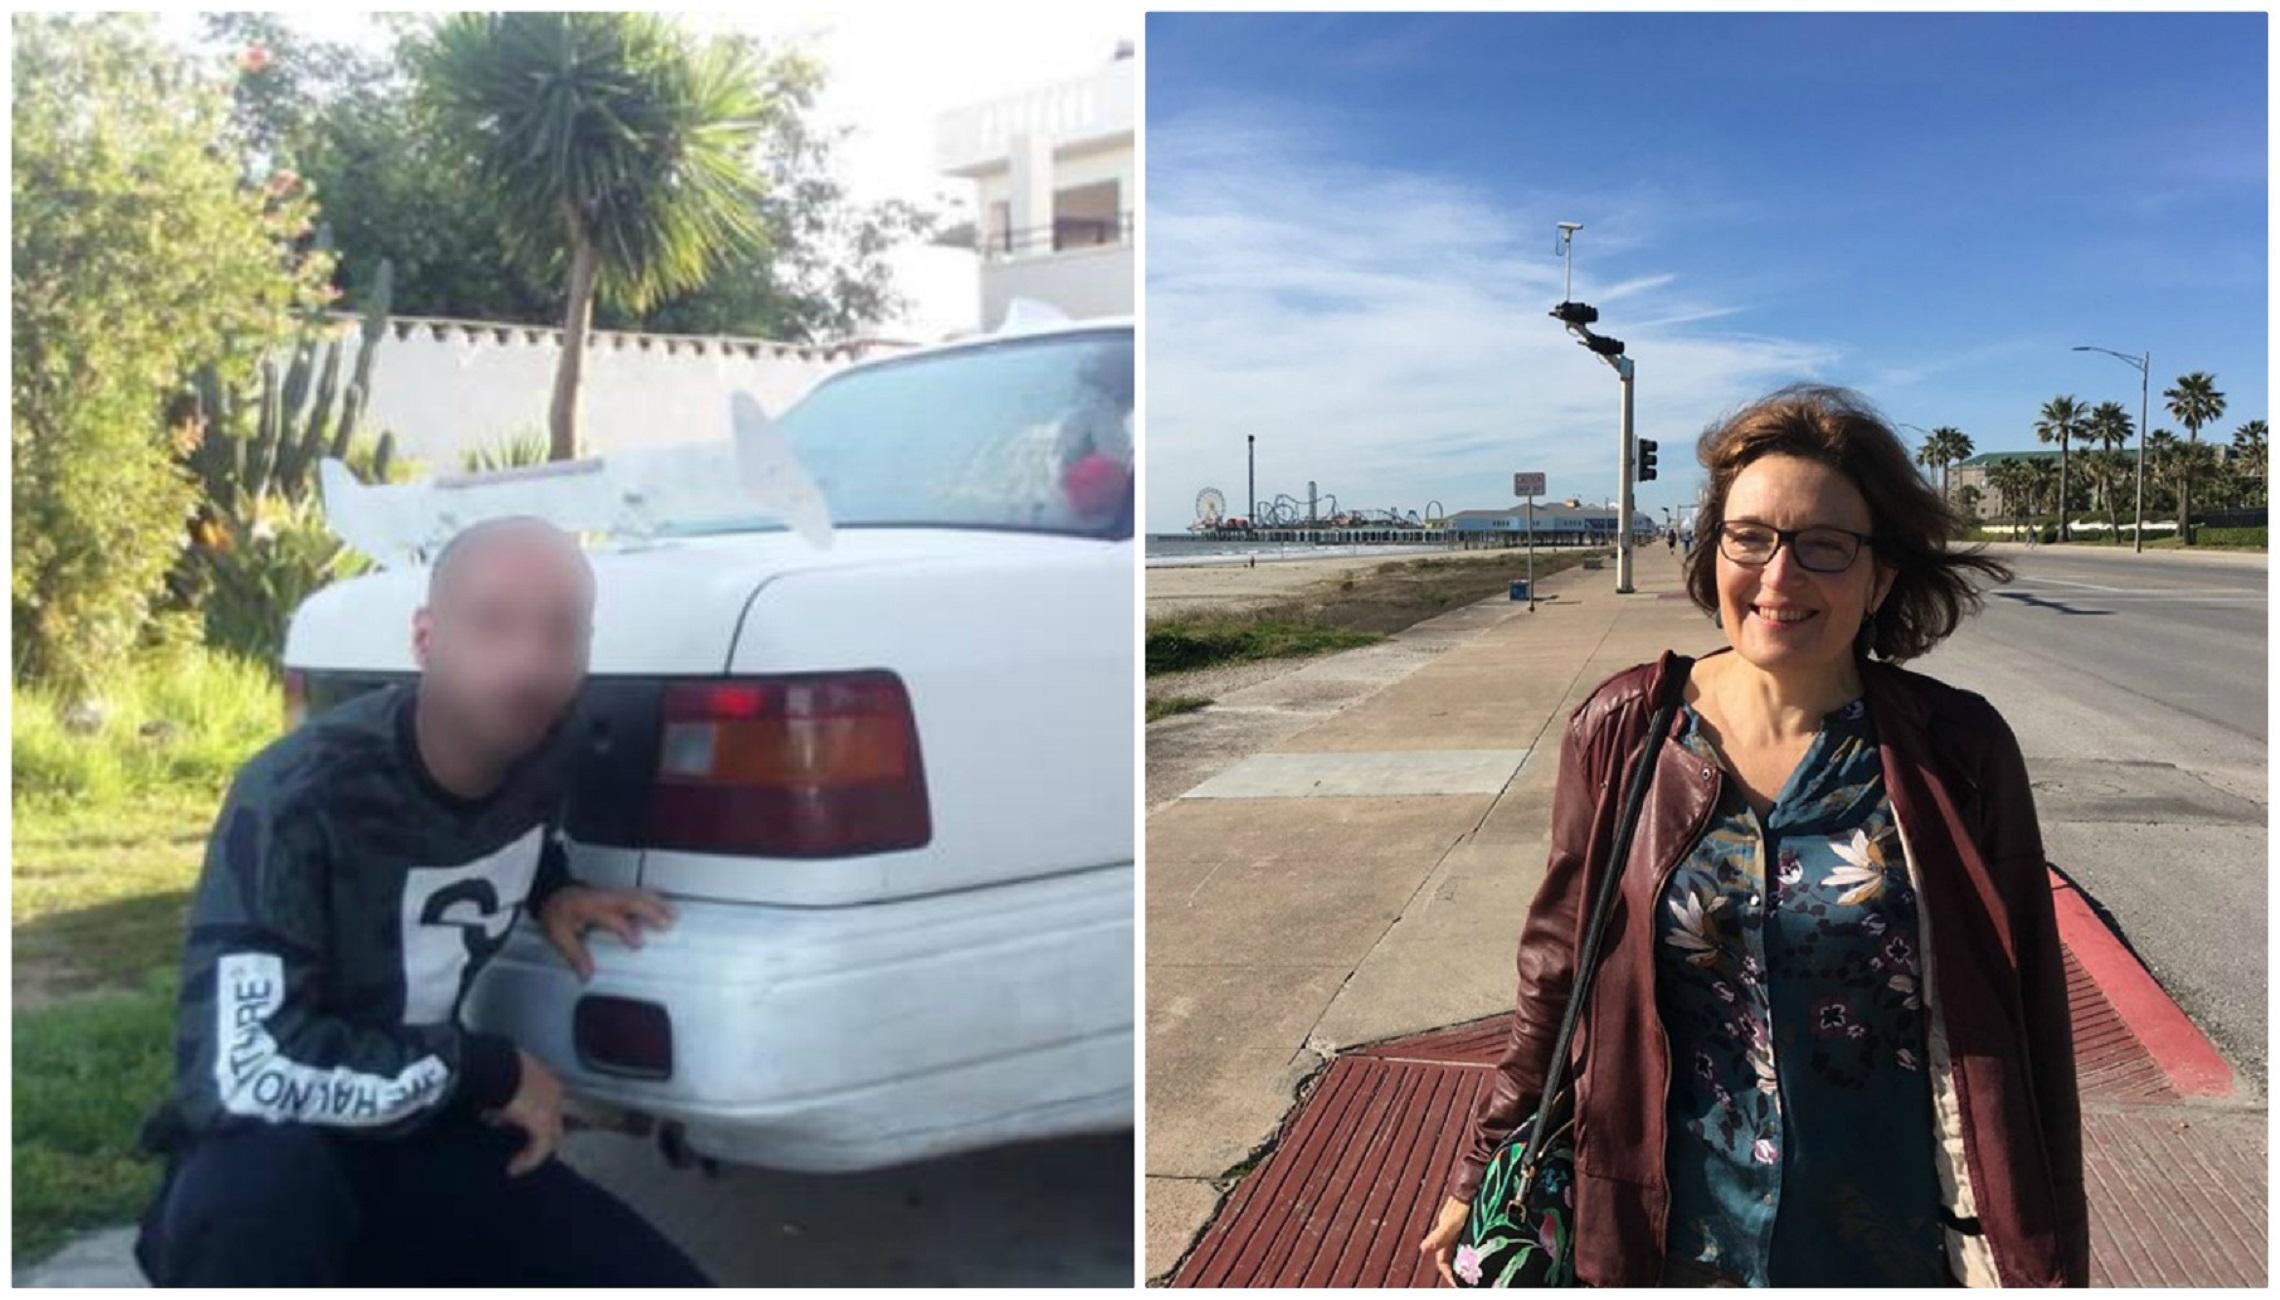 Suzanne Eaton: Νέα στοιχεία! Οι τρεις επιθέσεις «καρμπόν» και η αναγνώριση